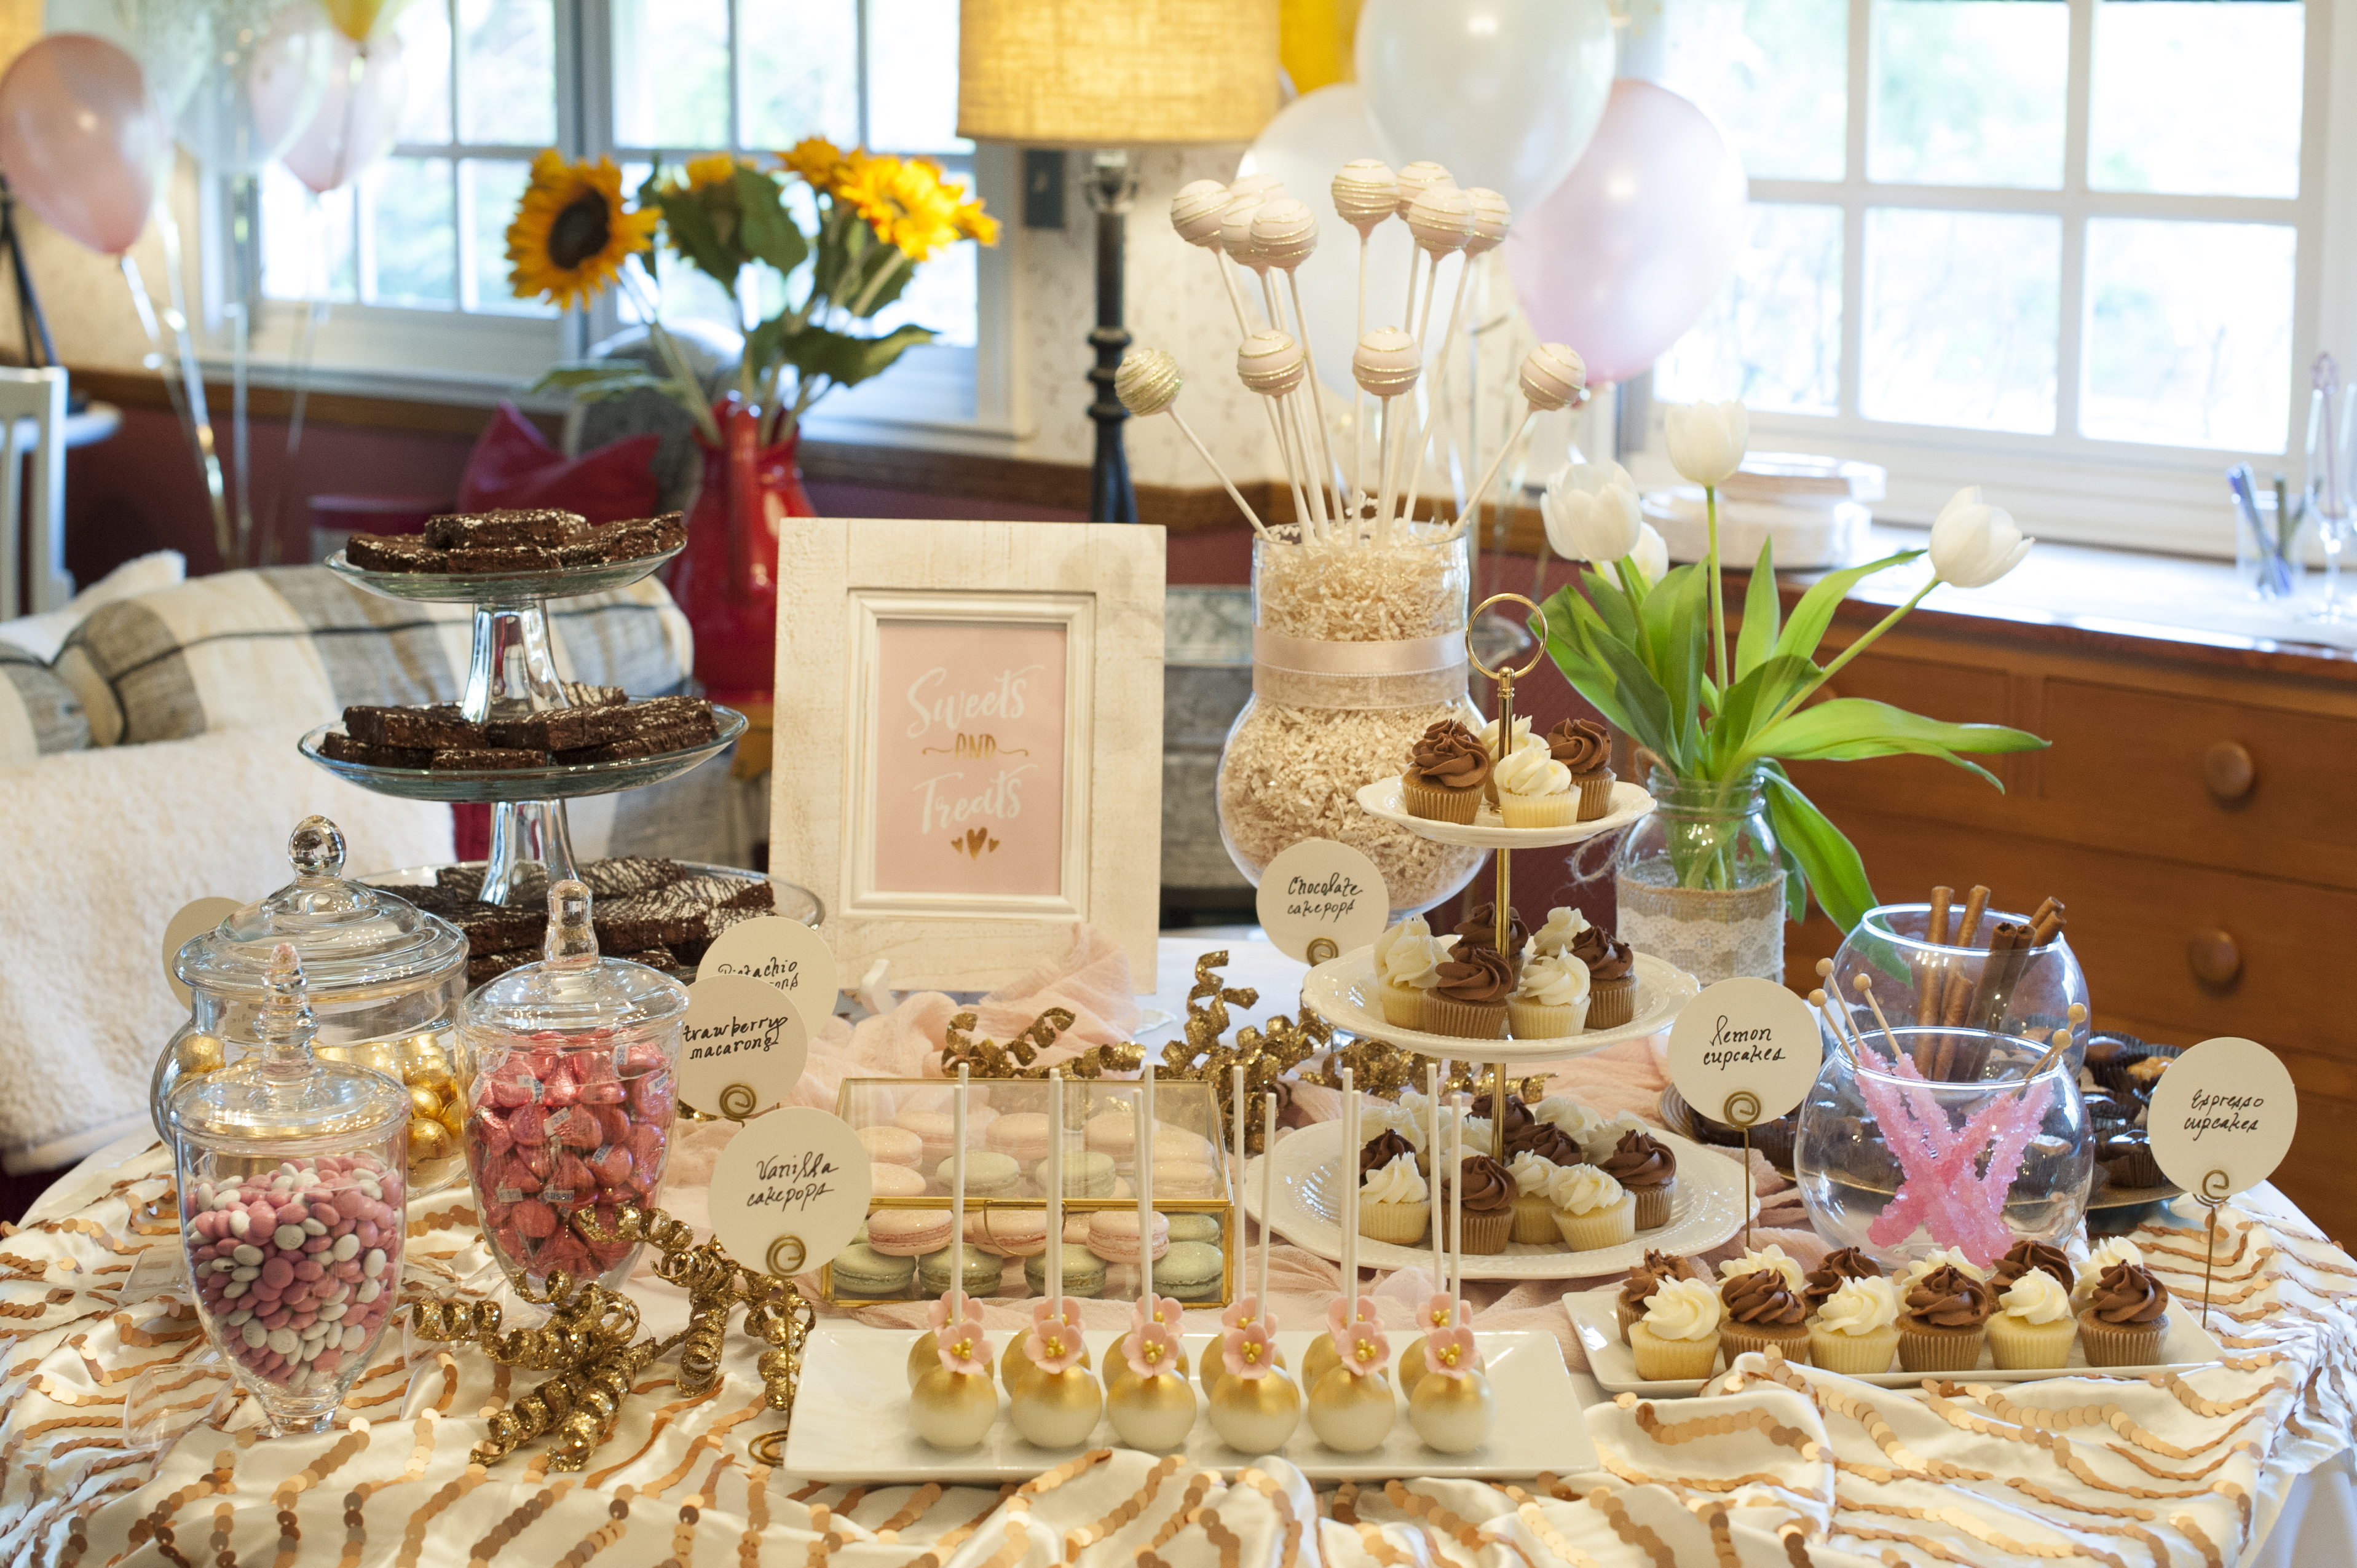 desserts3.30.18to4.15.18-1756